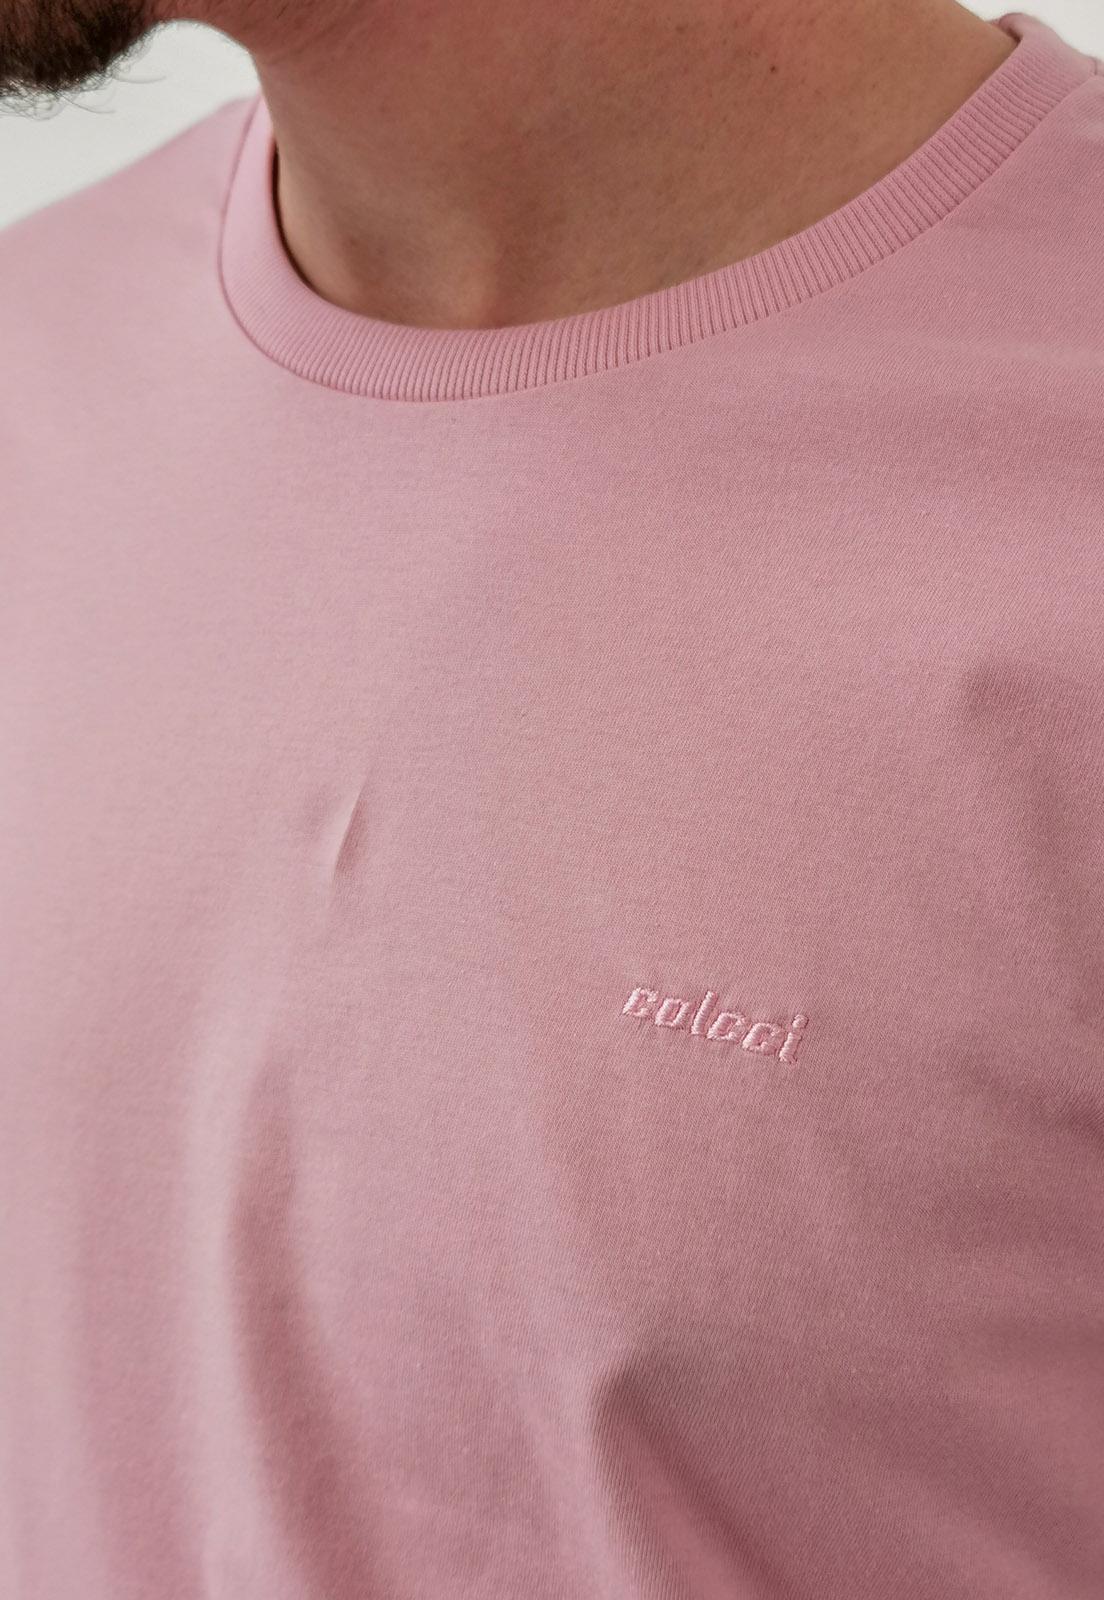 Camiseta Colcci Básica Rosa Logo